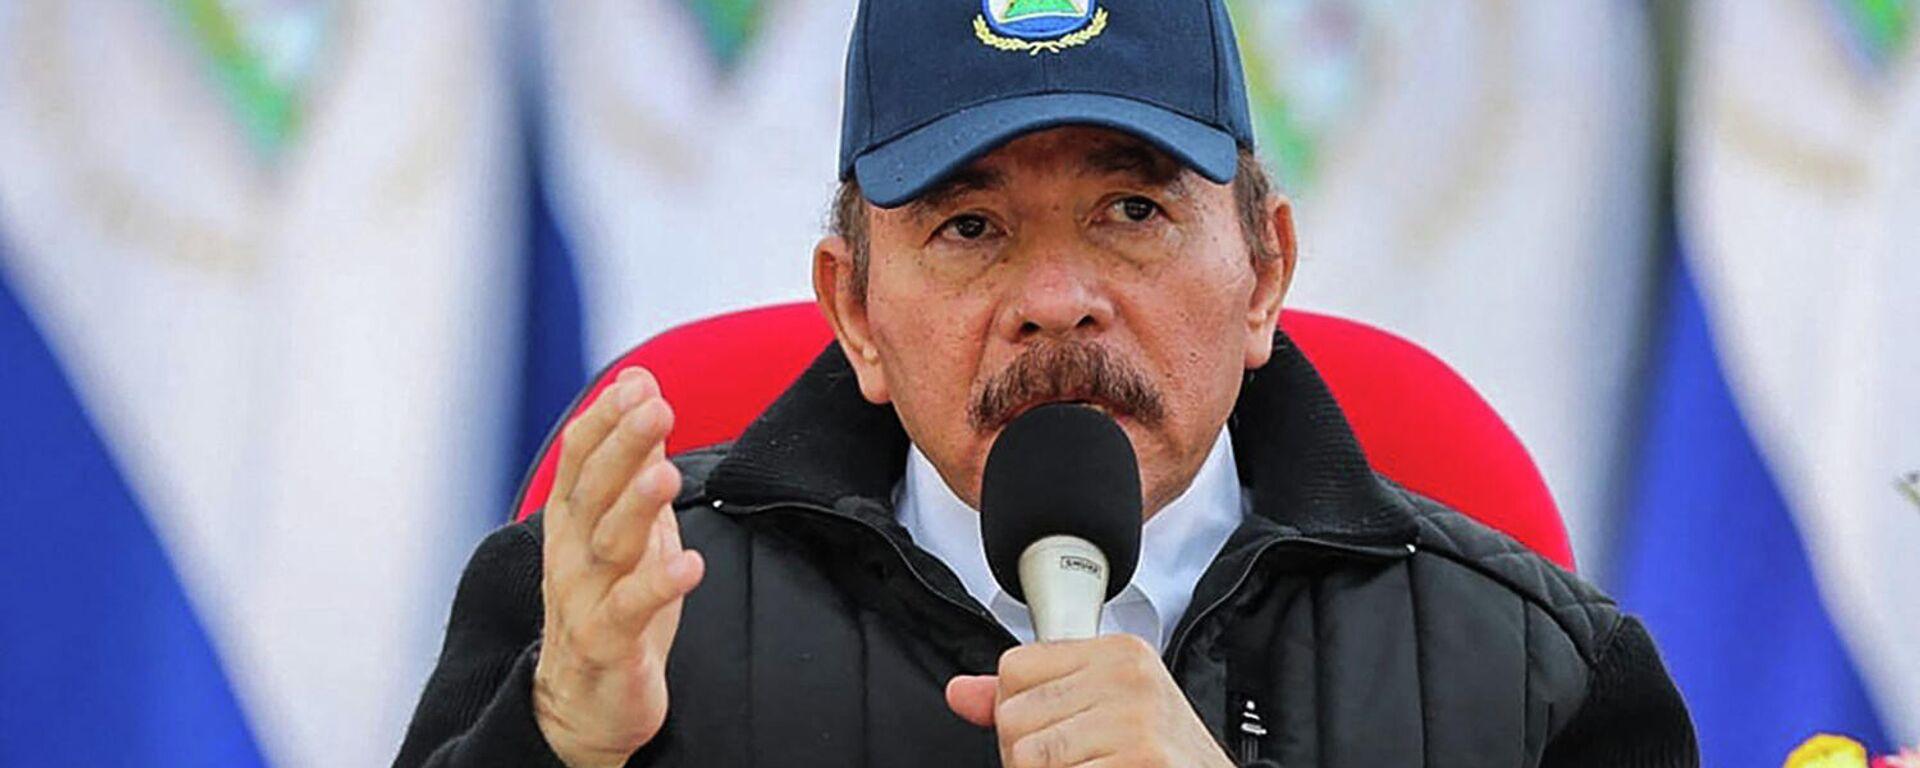 Daniel Ortega, presidente de Nicaragua - Sputnik Mundo, 1920, 11.09.2021